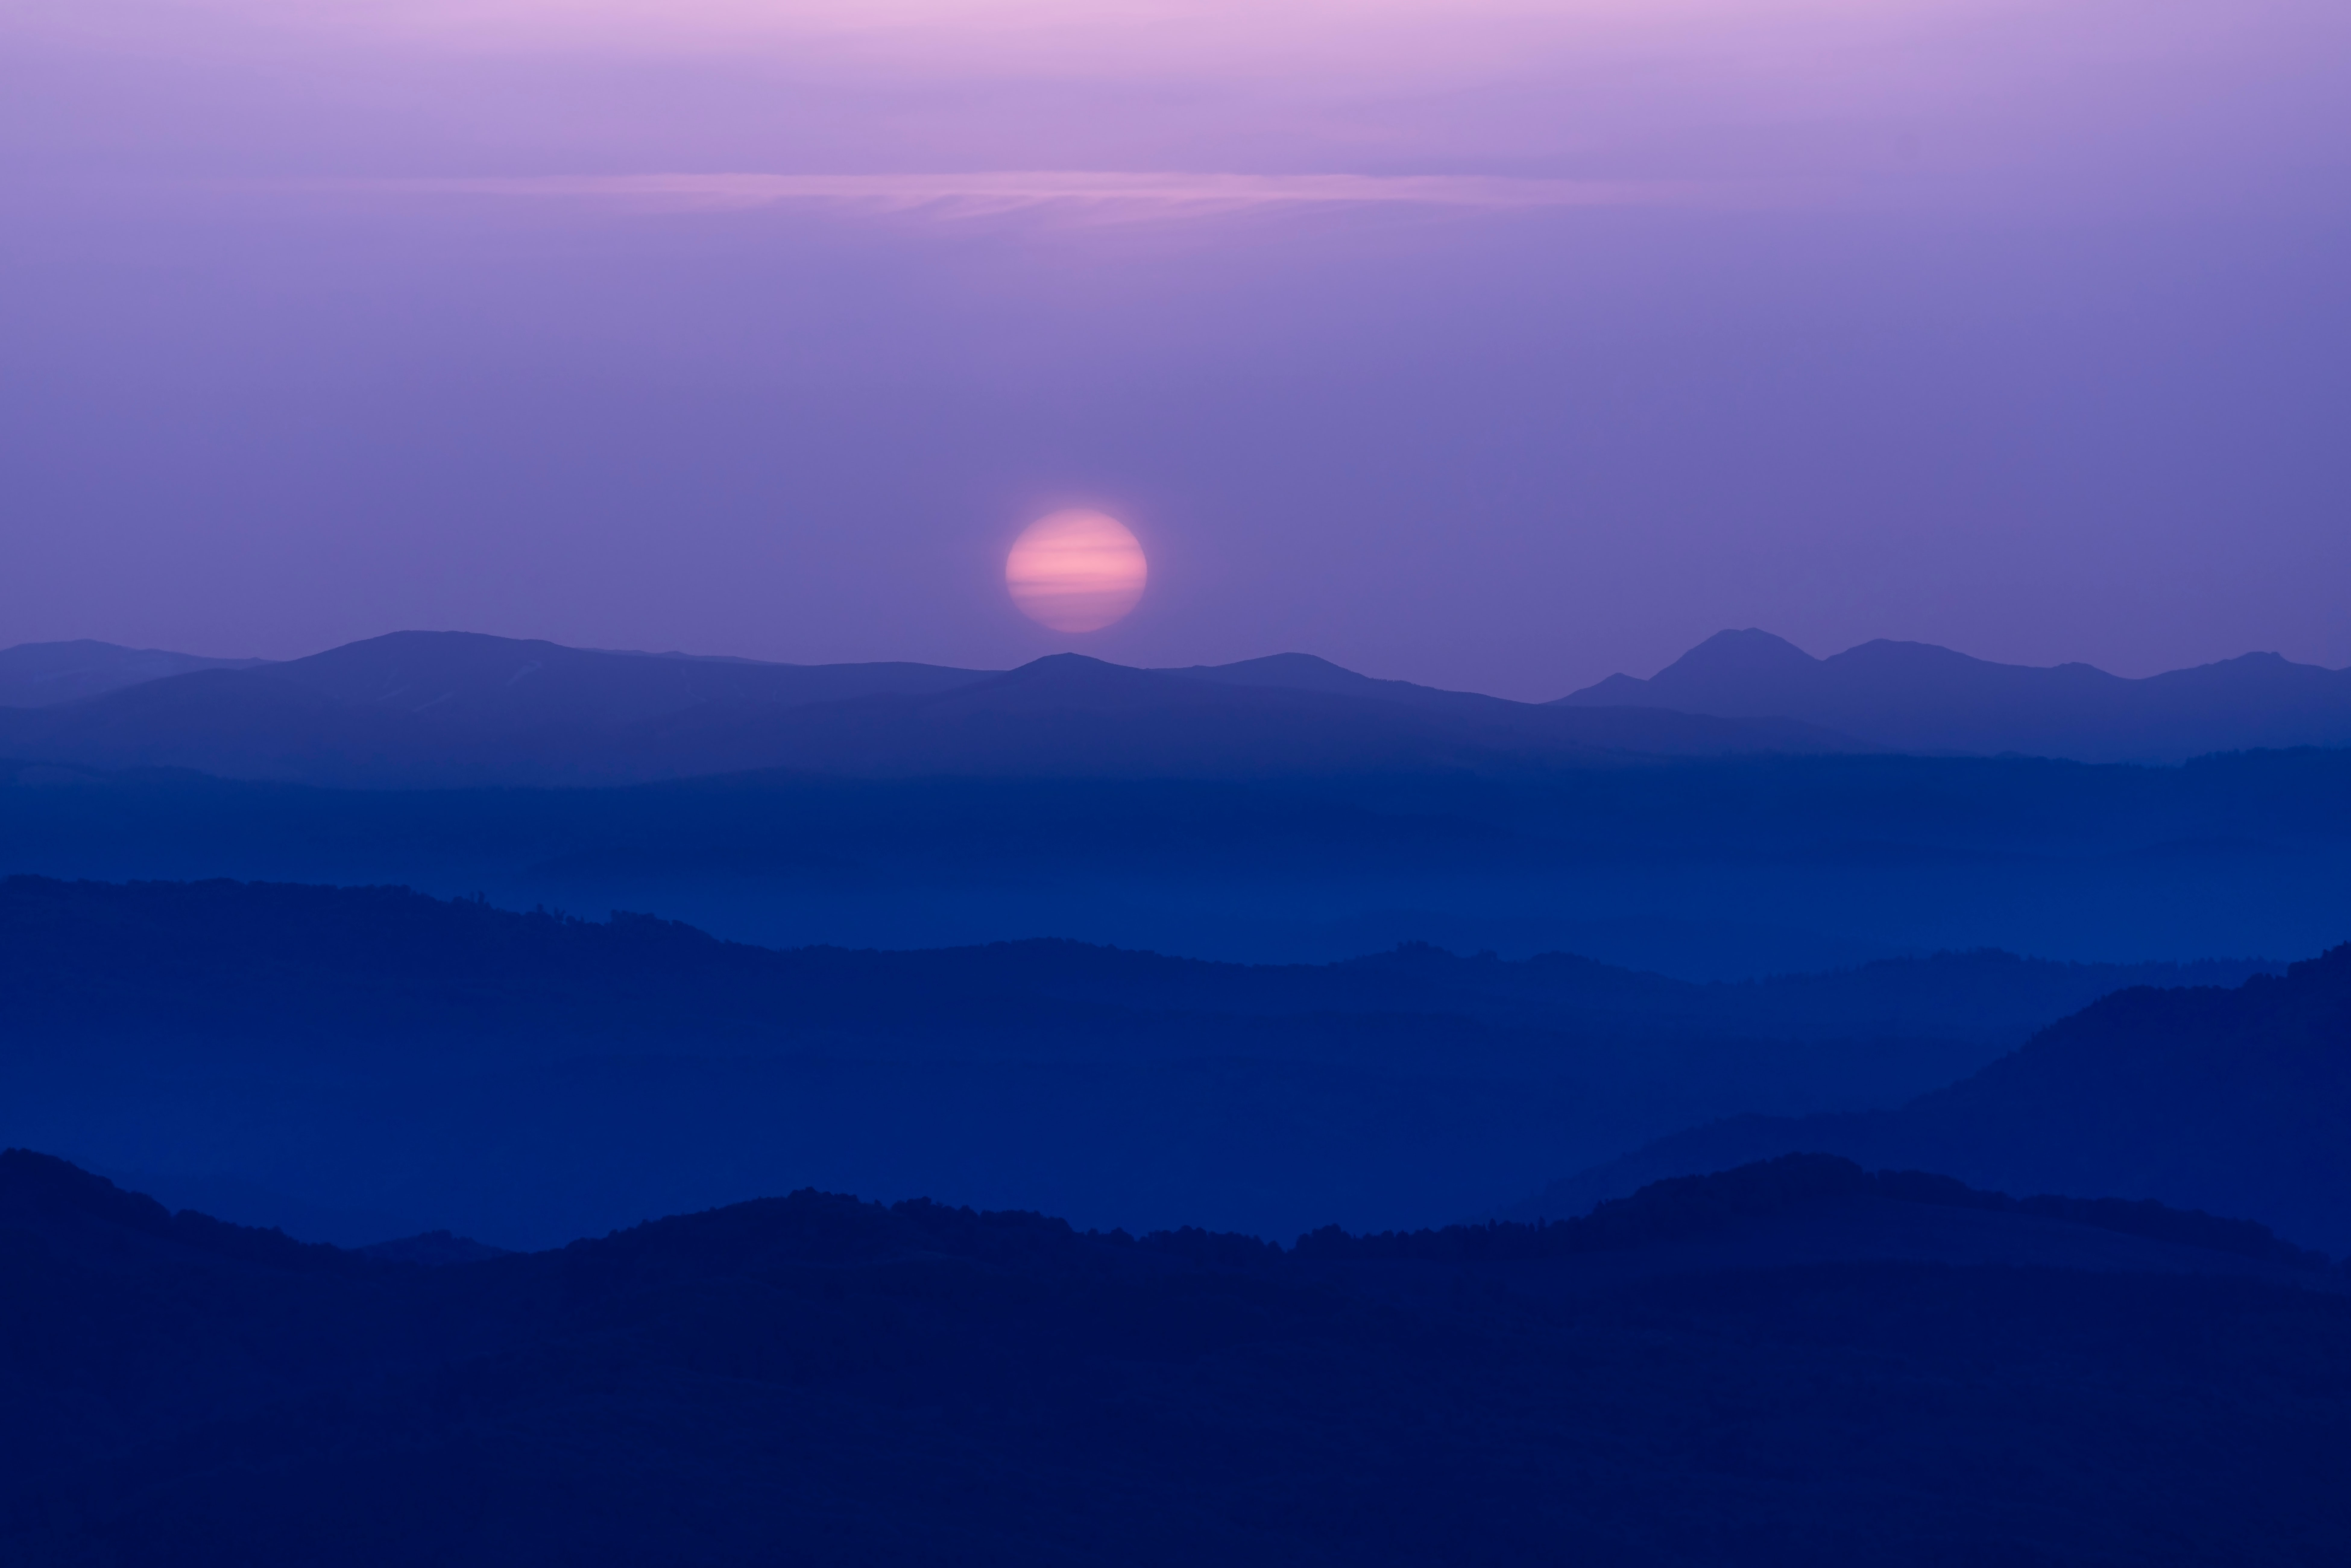 silhouette mountains 4k 1602501593 - Silhouette Mountains 4k - Silhouette Mountains 4k wallpapers